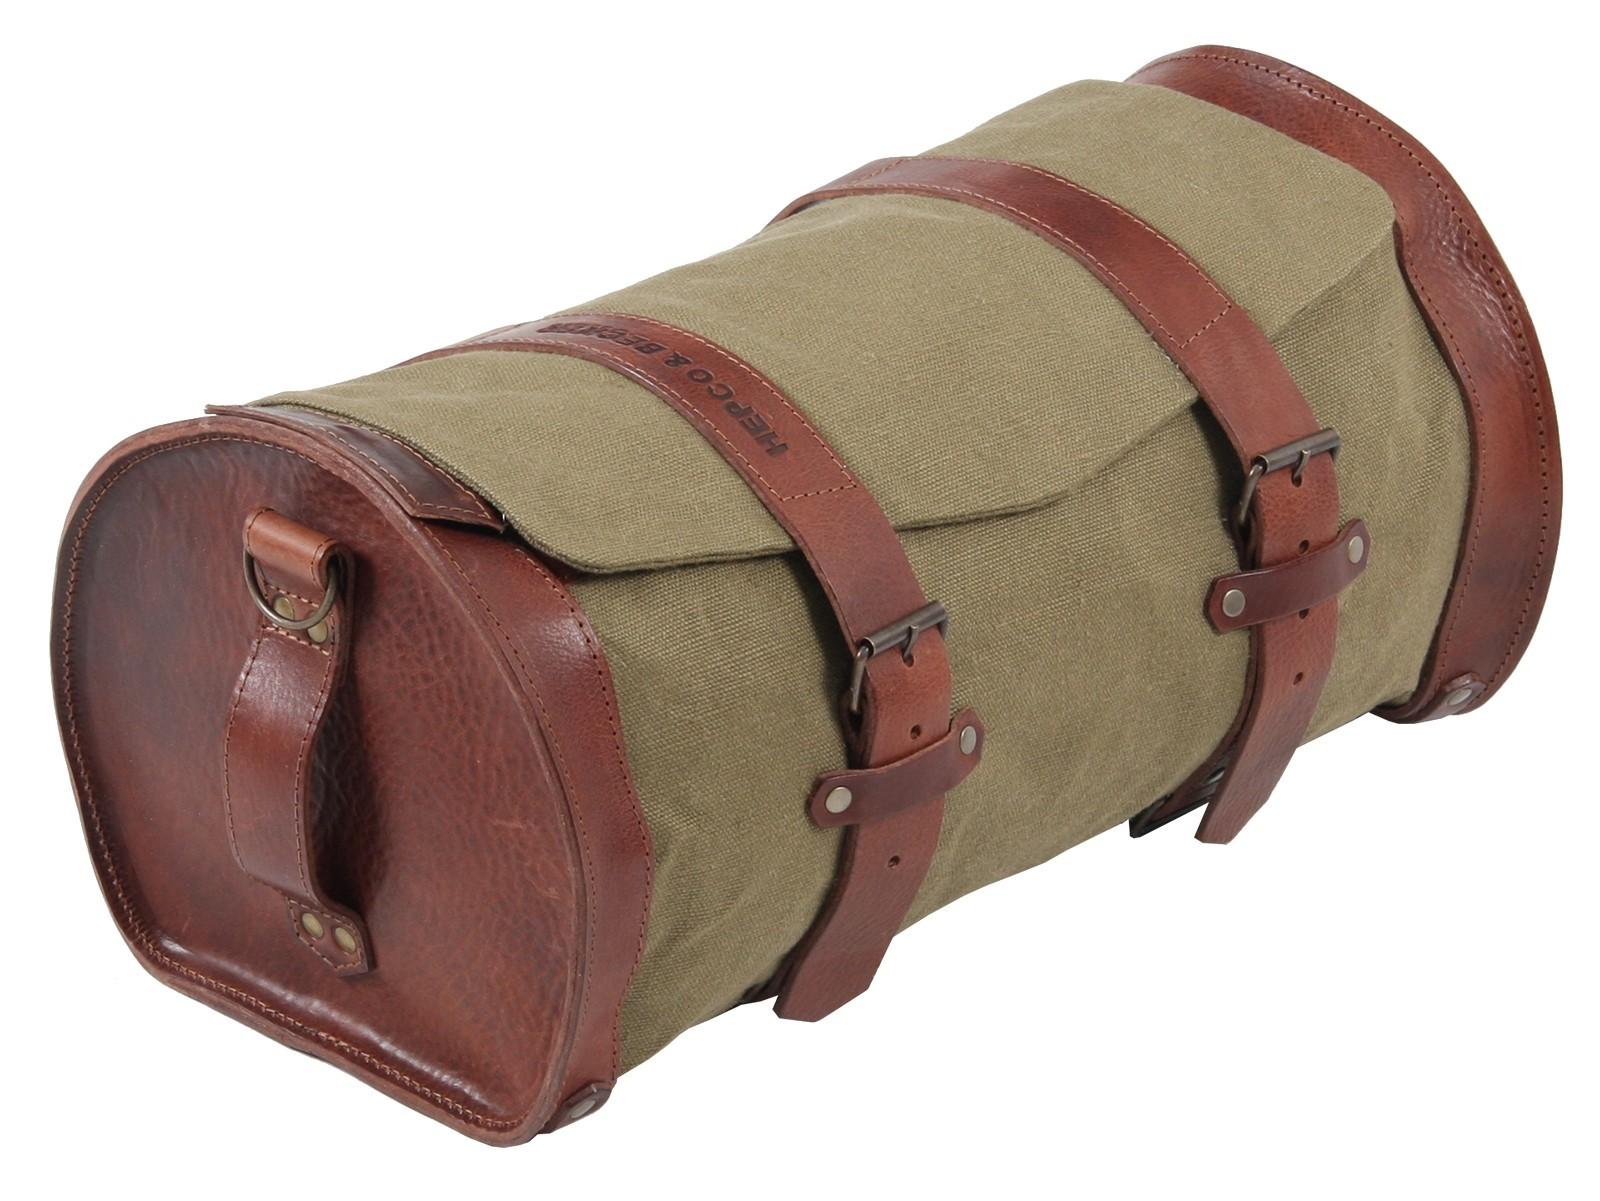 Hepco & Becker Legacy Rear Bag 28 ltr - Green